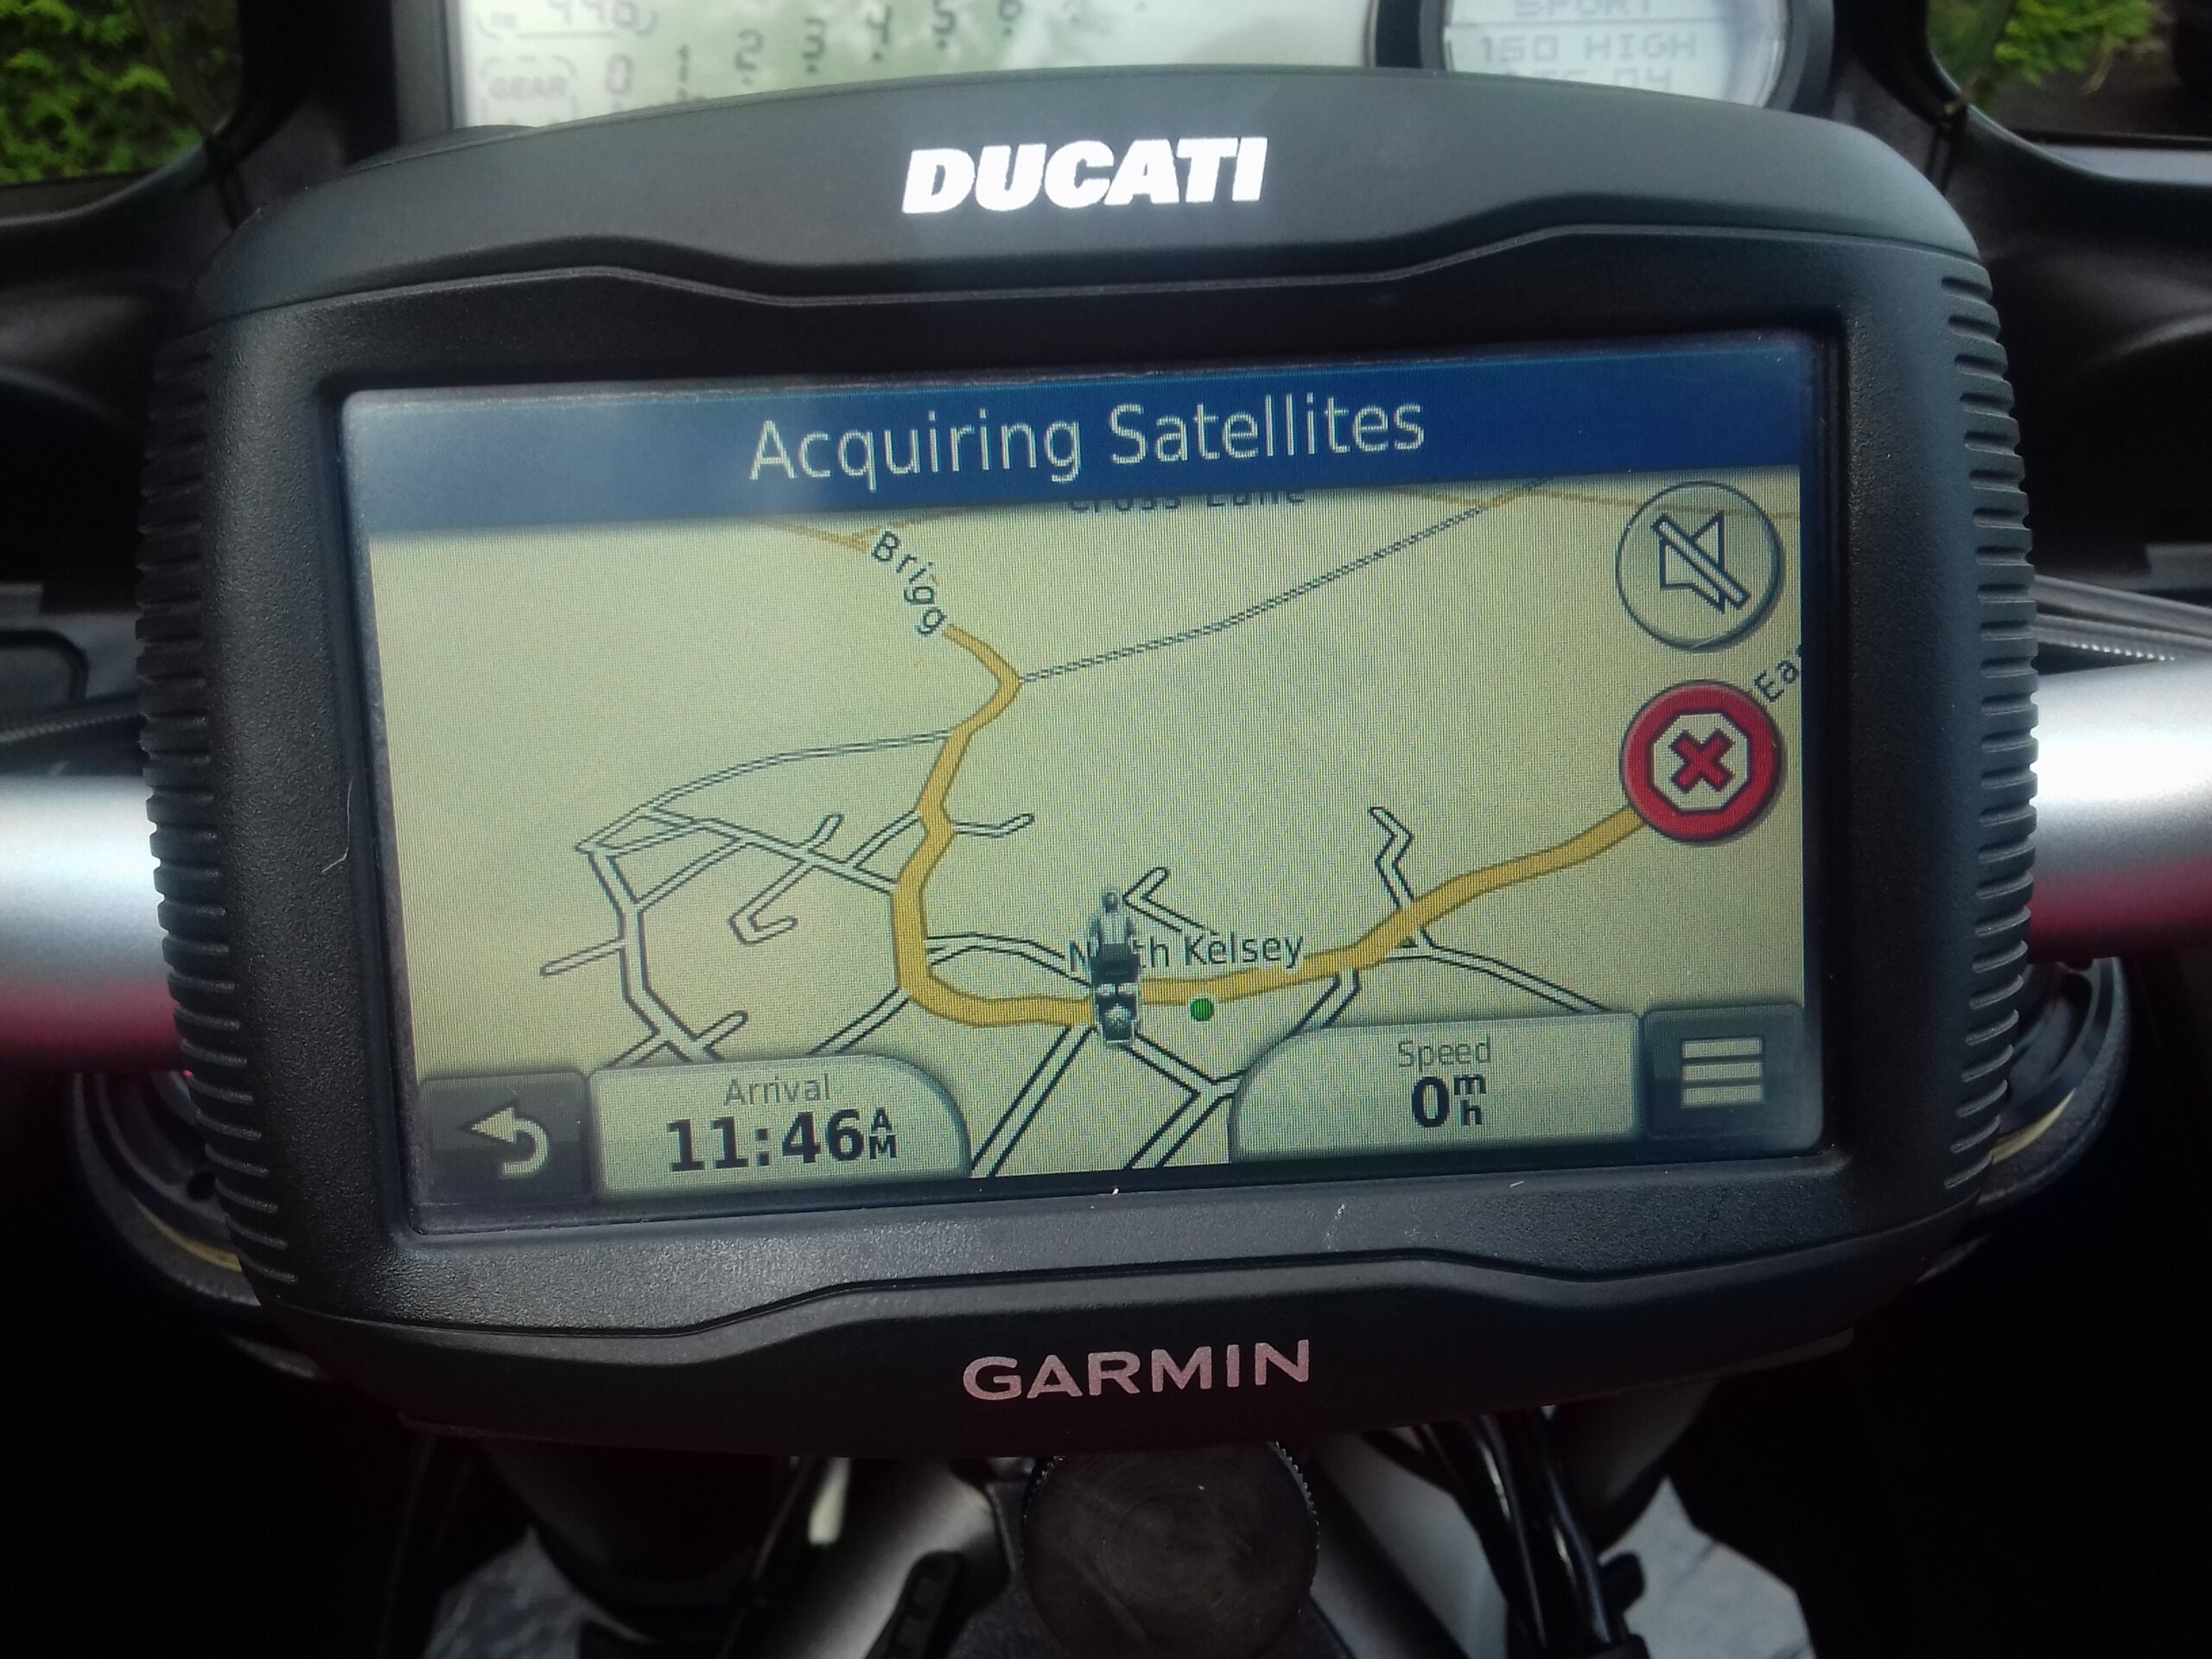 DUCATI MULTISTRADA 1200 FULL LUGGAGE-SAT NAV-TERMIGNONI EXHAUST